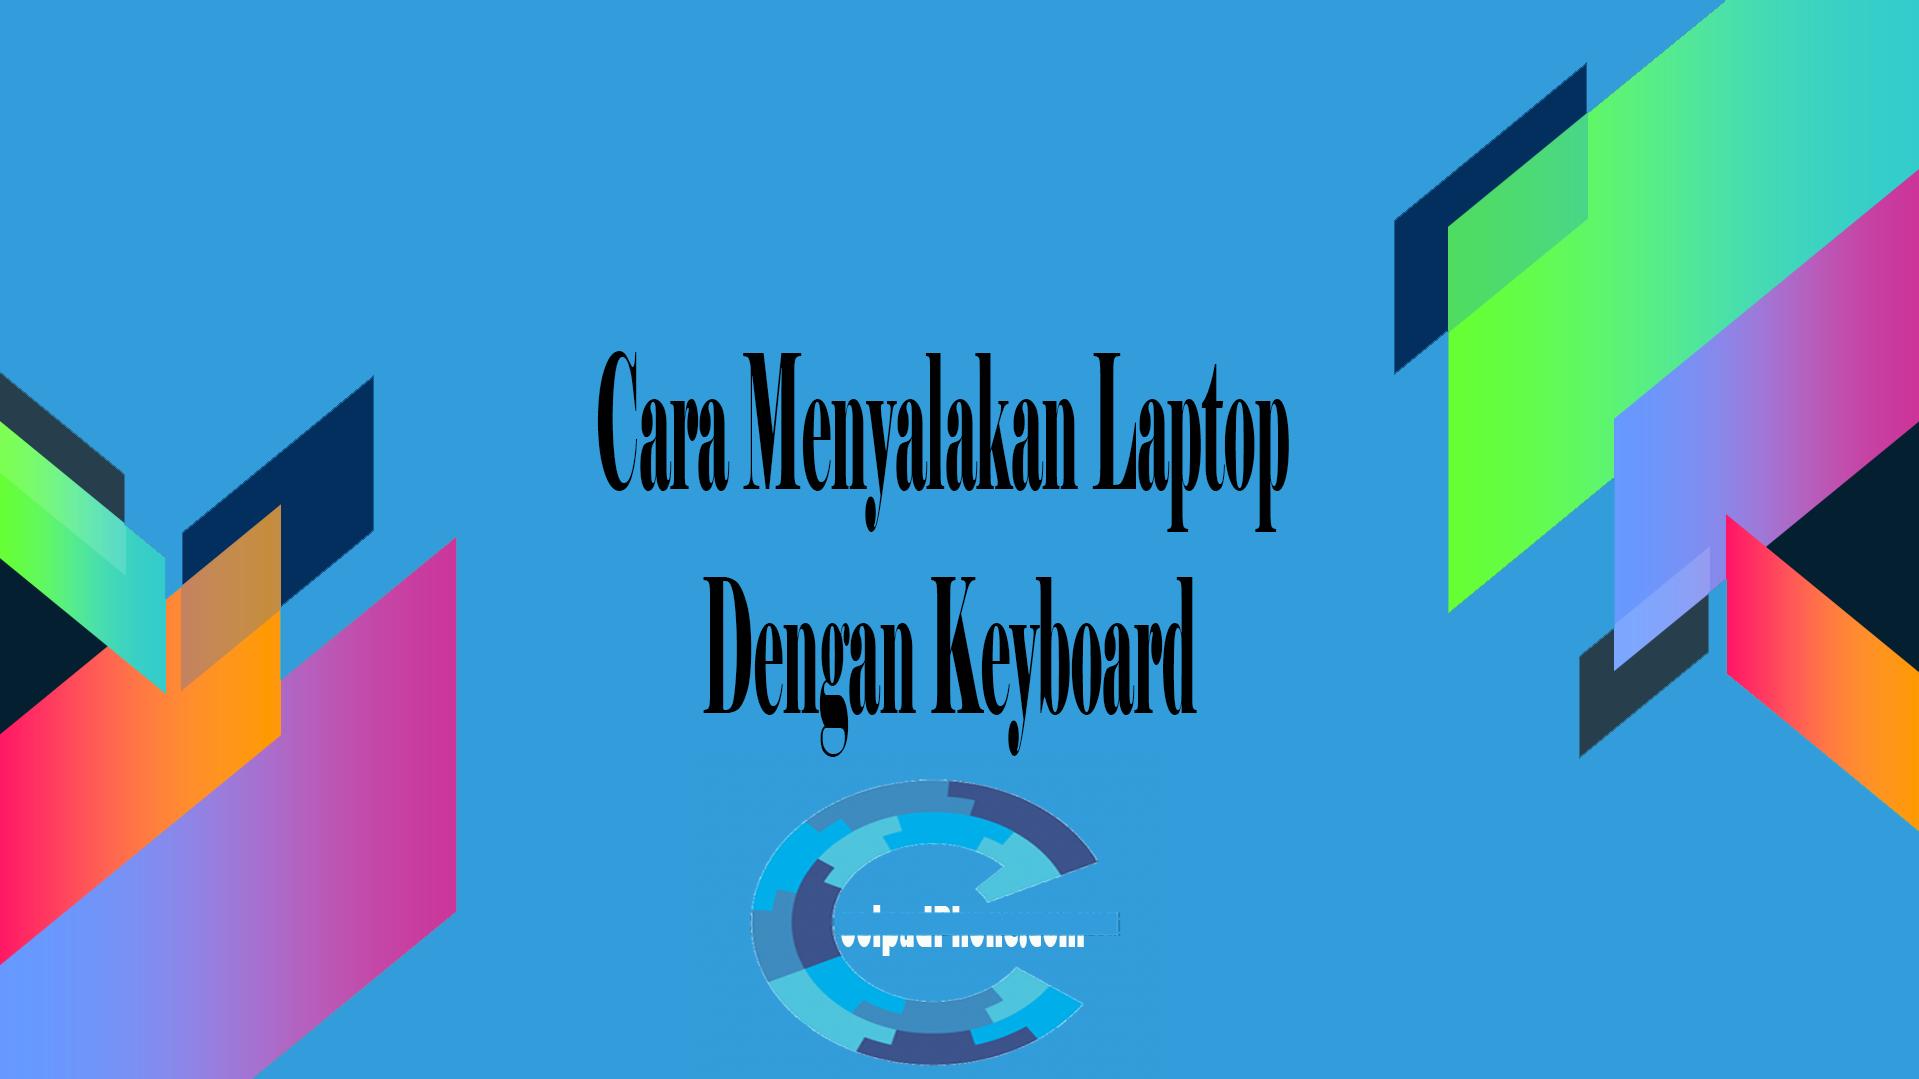 Cara Menyalakan Laptop Dengan Keyboard